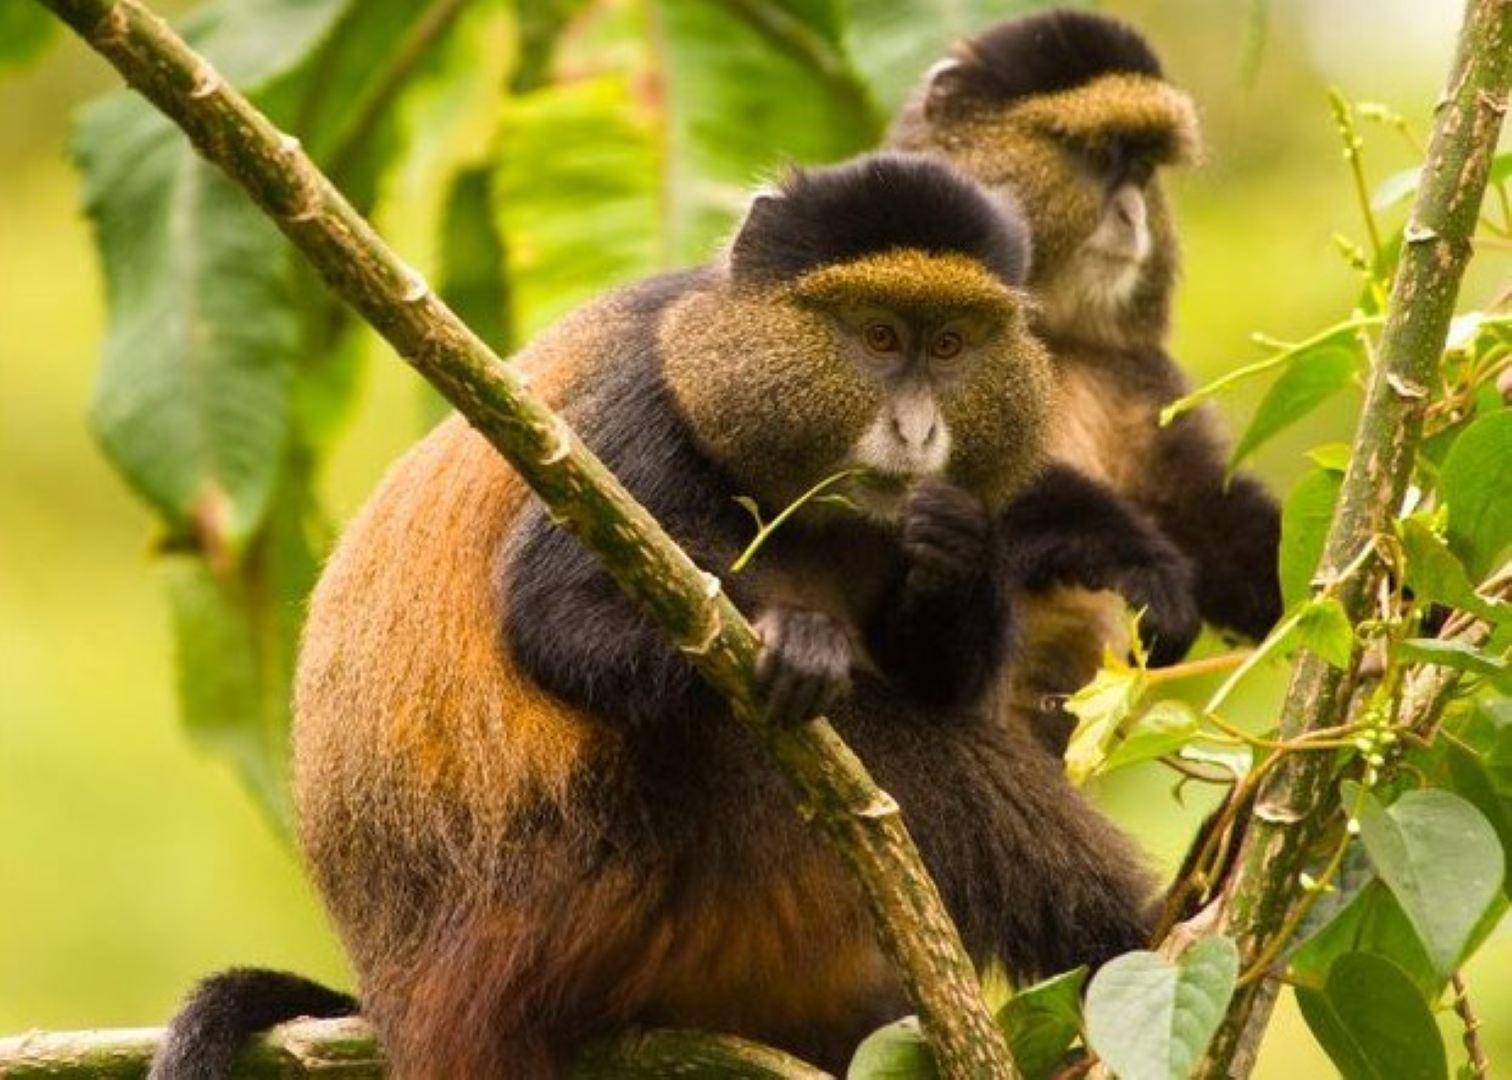 The golden monkeys in Mgahinga gorilla national park